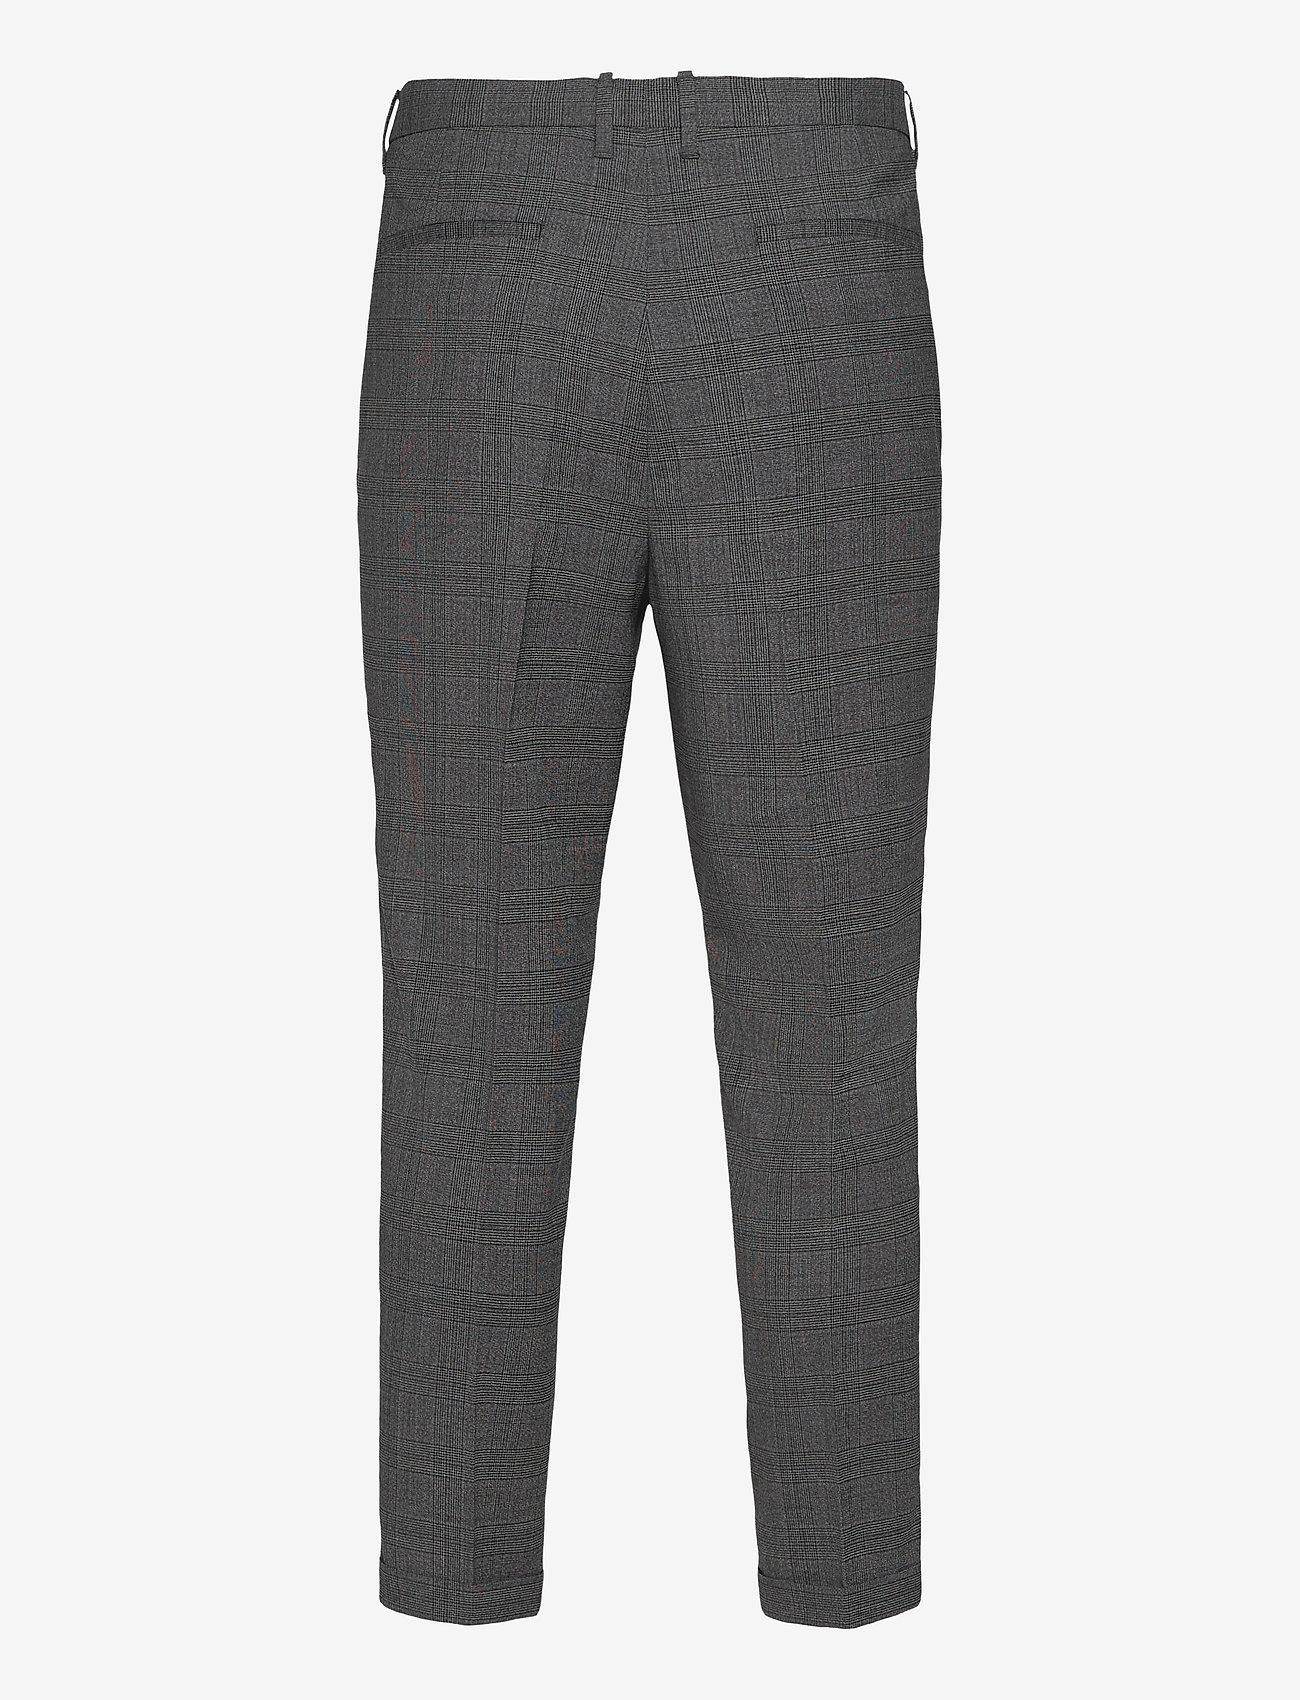 AllSaints - BATALHA TROUSER - pantalons habillés - charcoal - 1